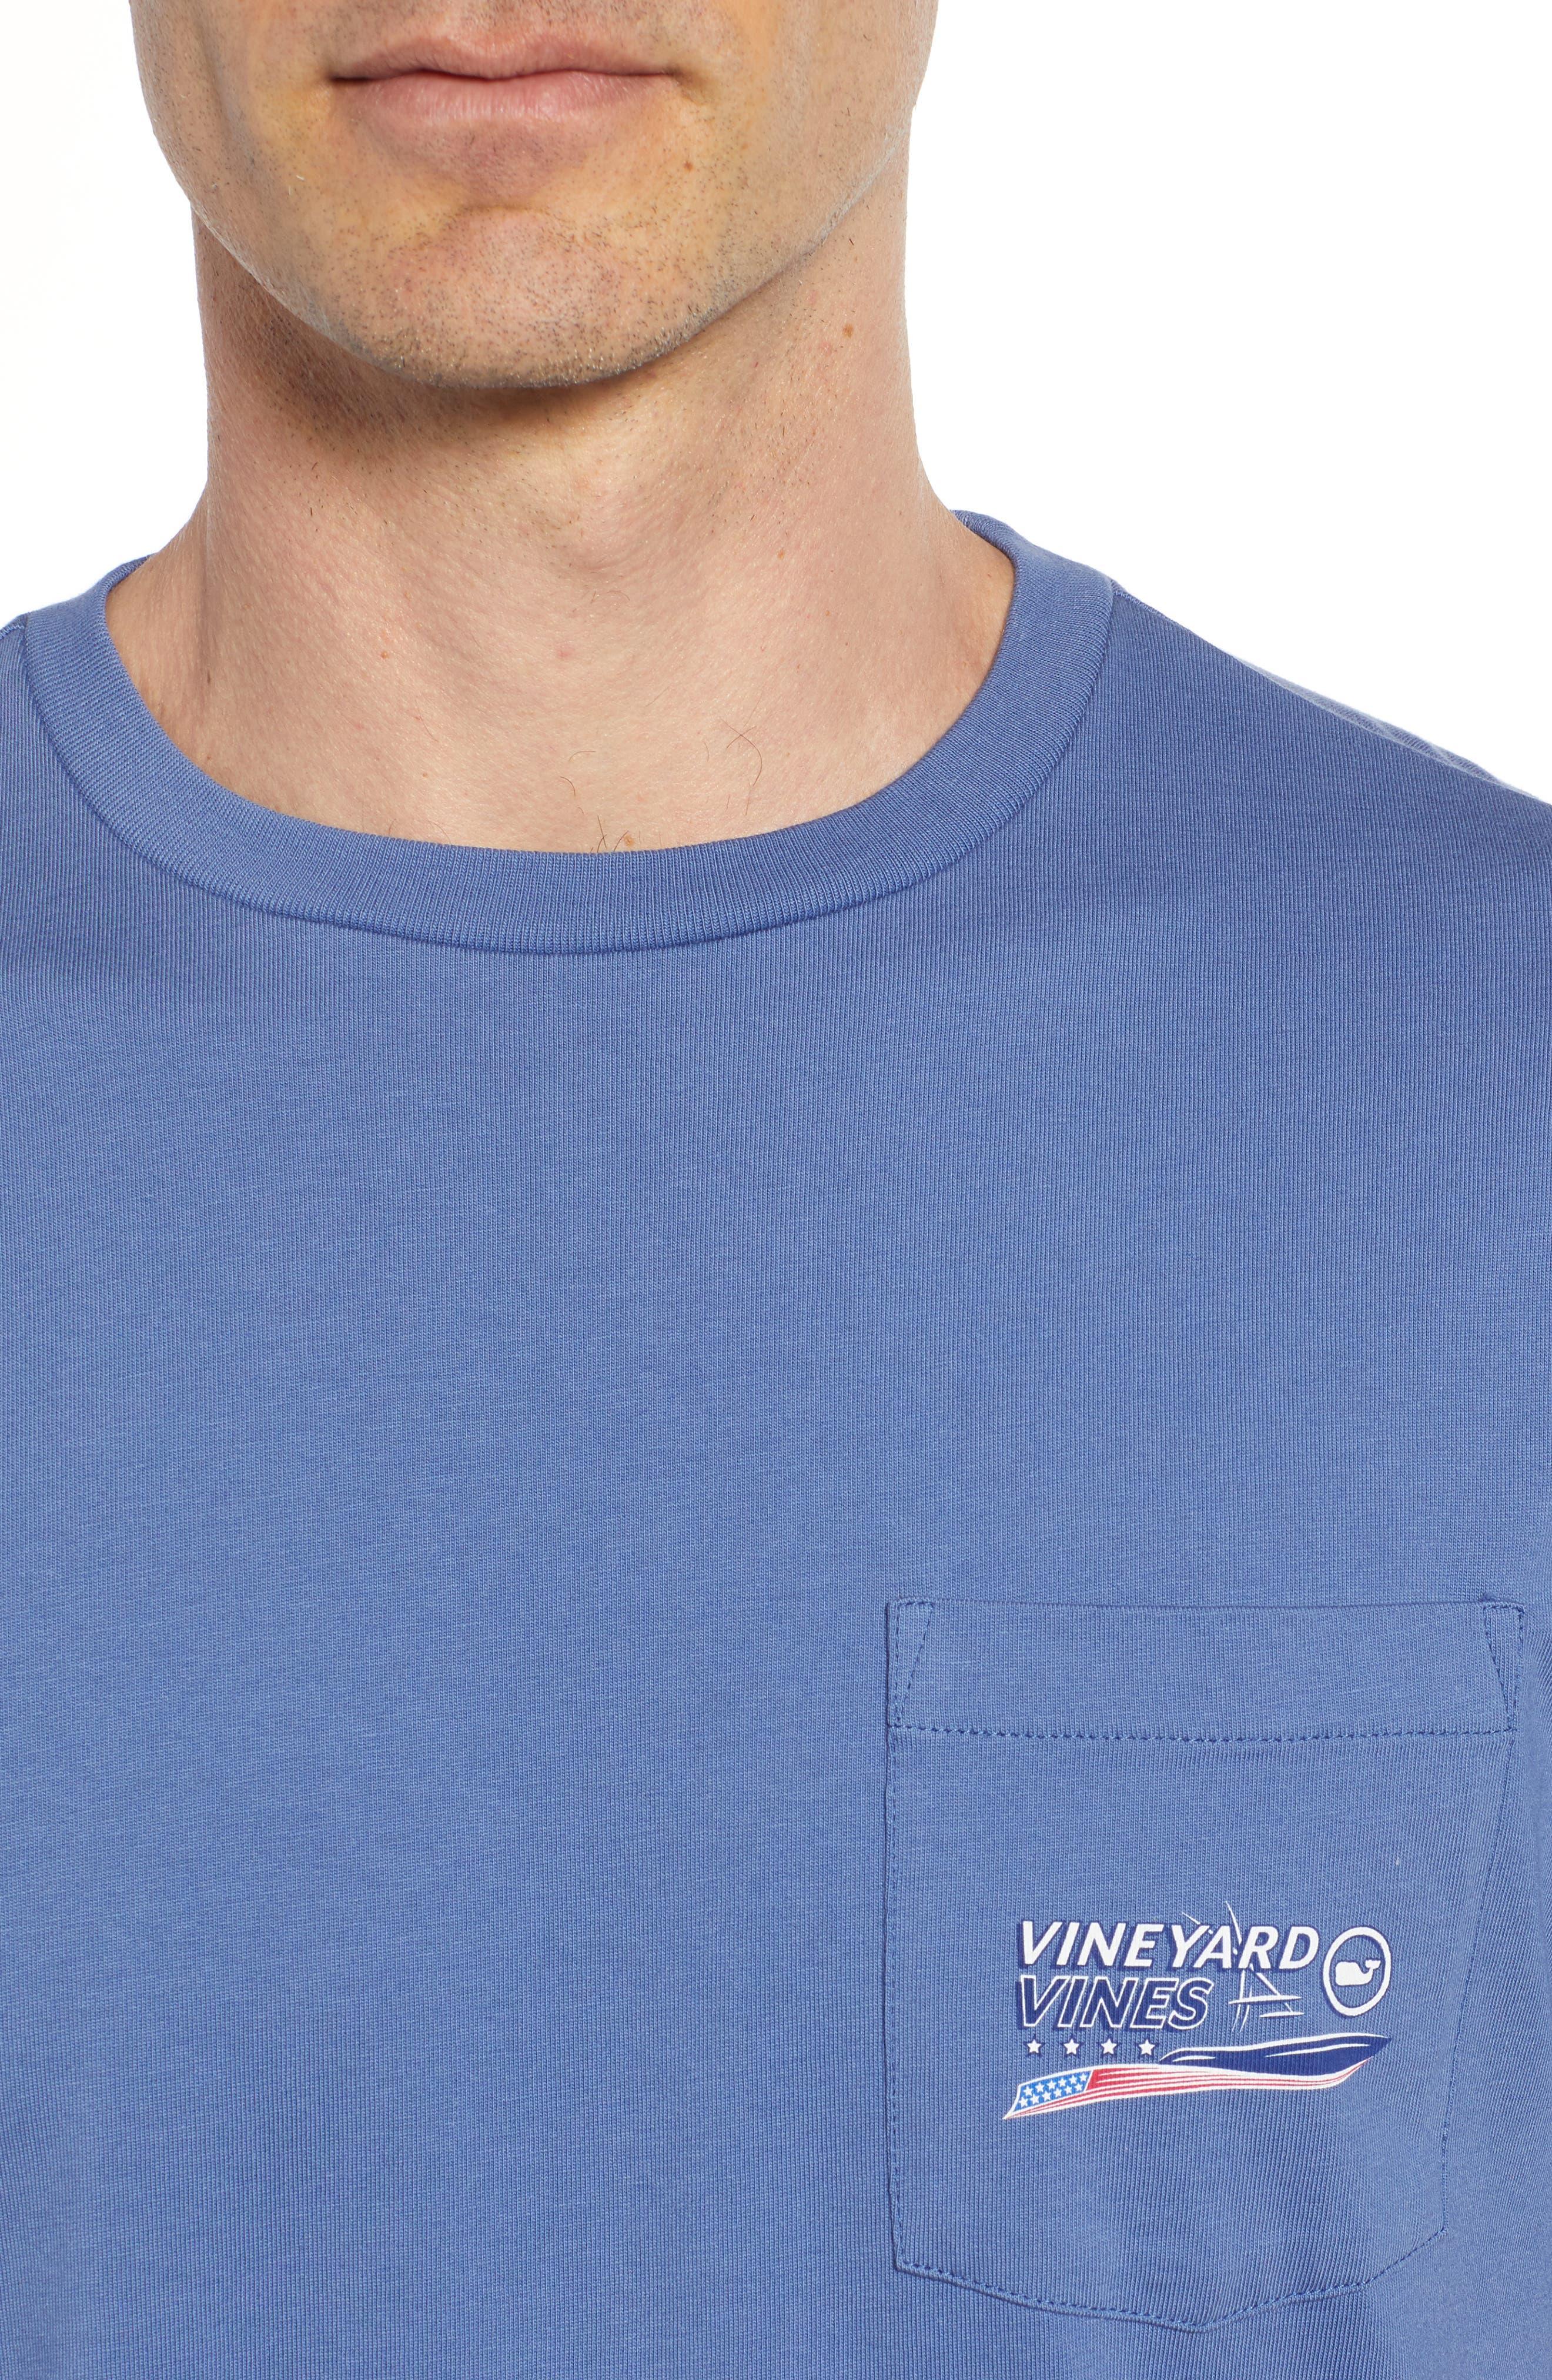 American Sportfisher T-Shirt,                             Alternate thumbnail 4, color,